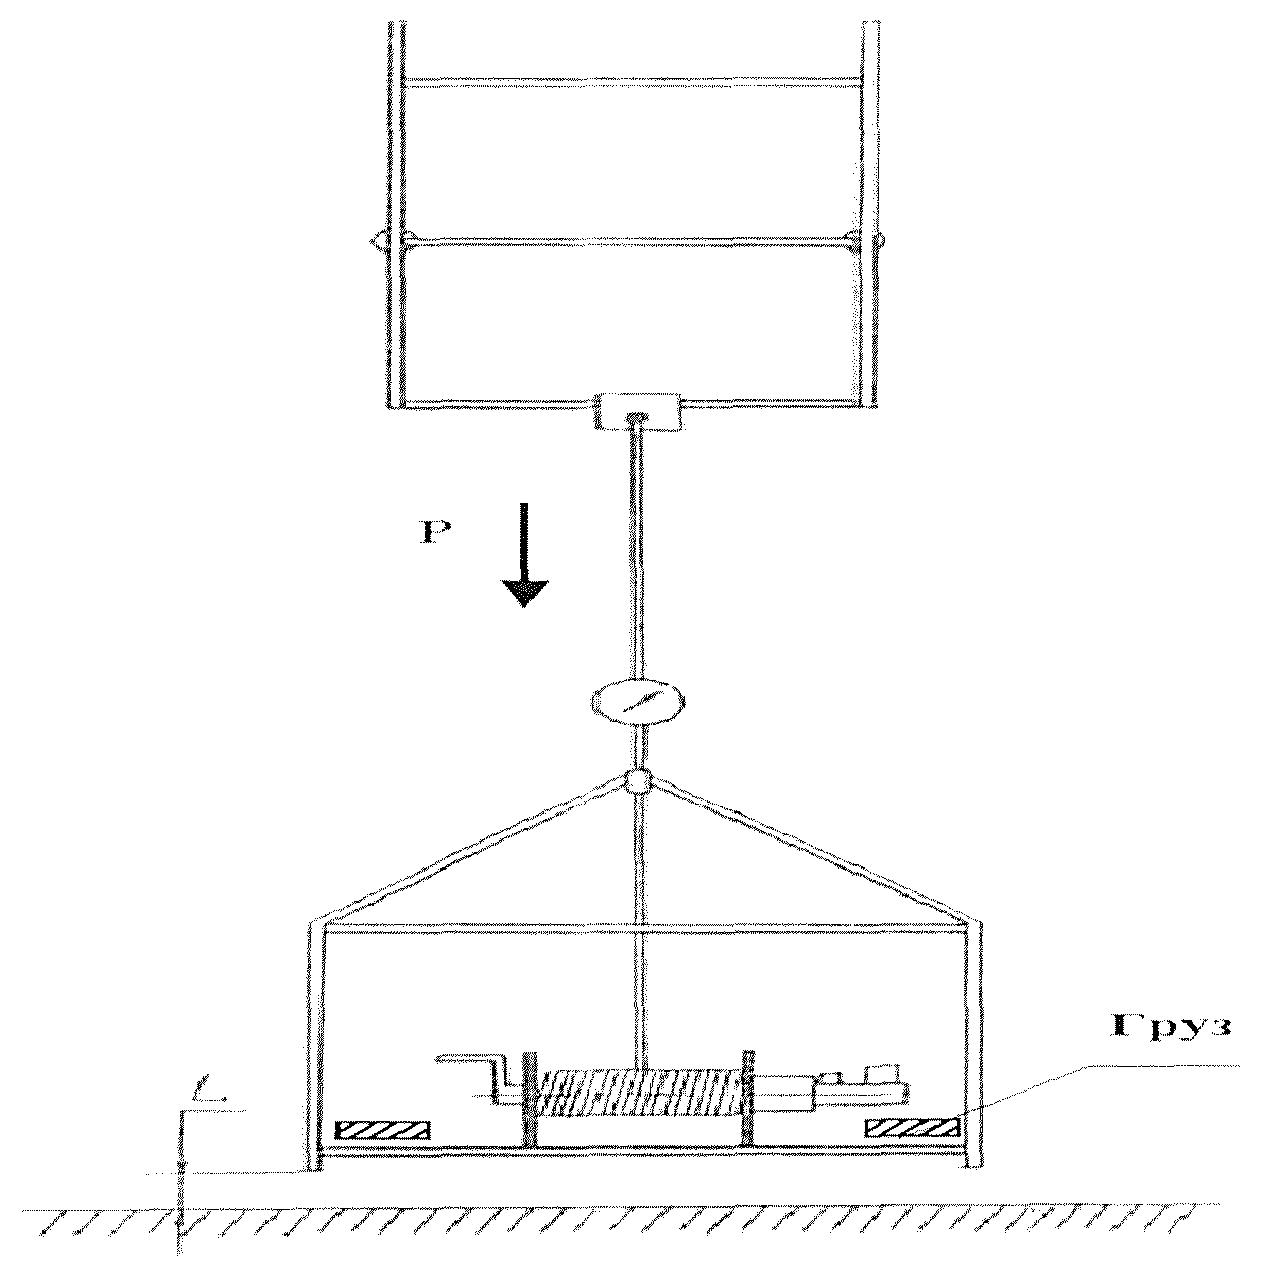 Сигнализатор загазованности домино инструкция